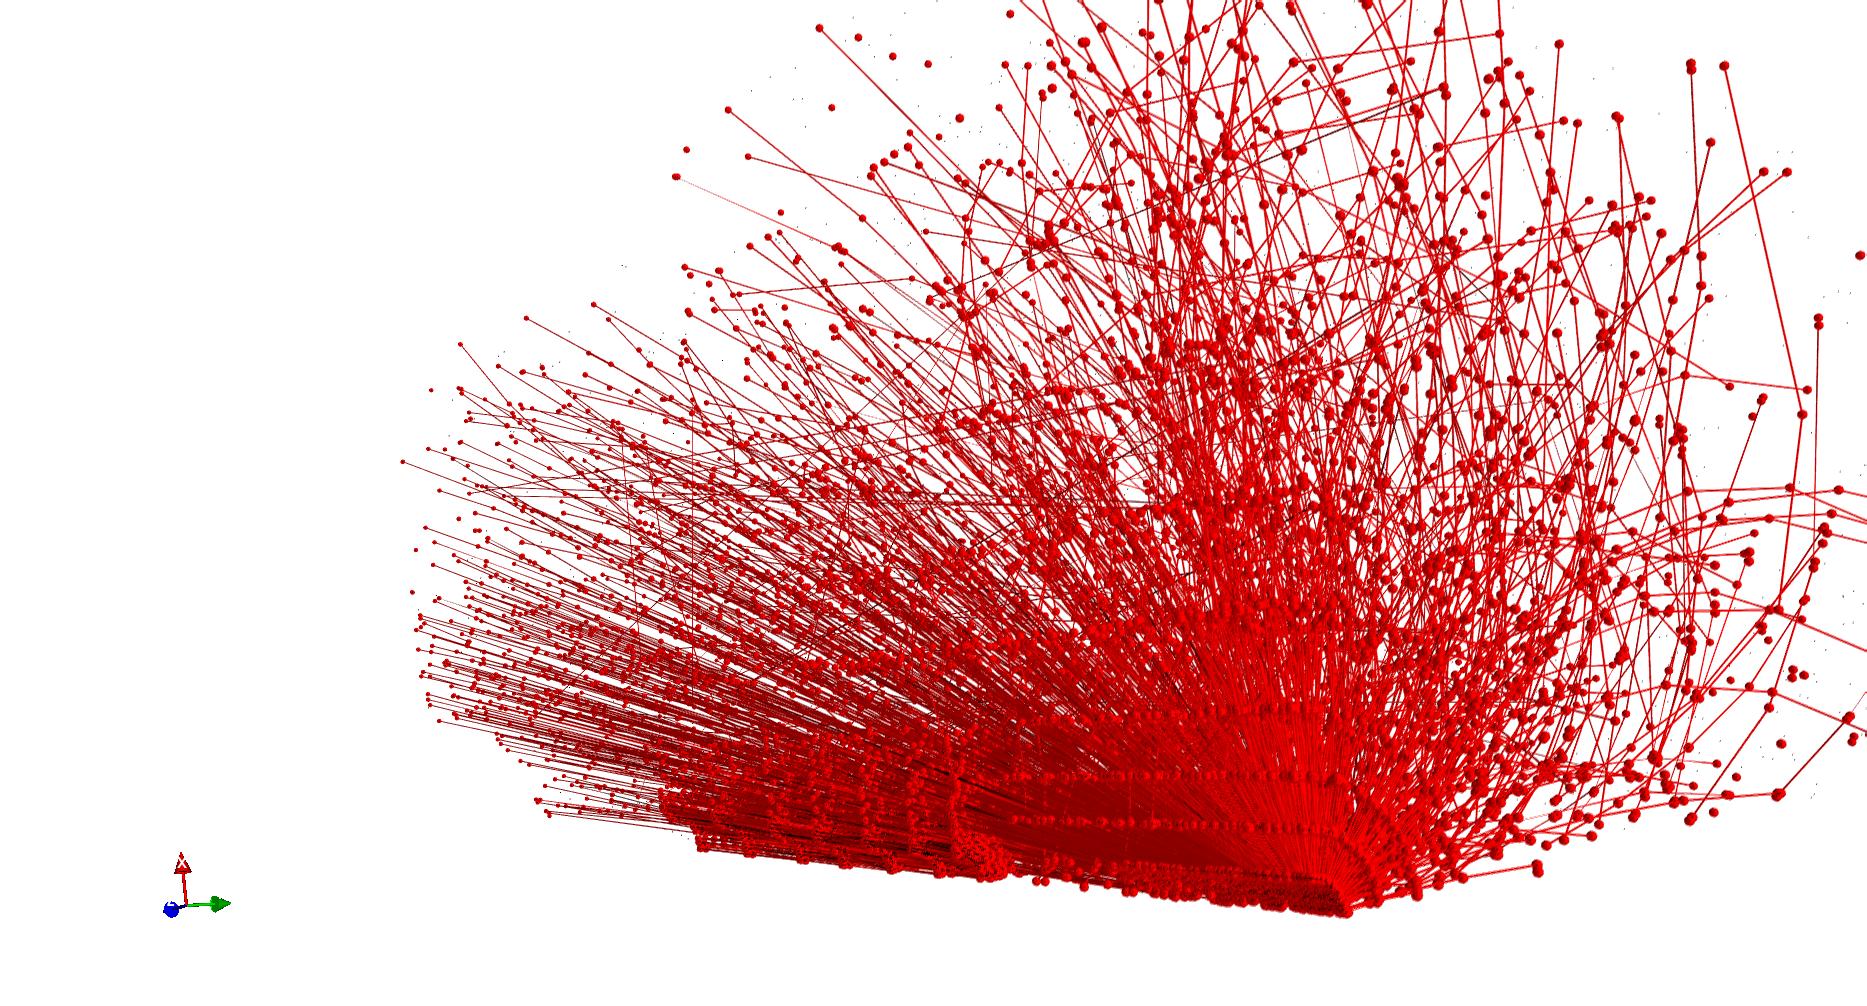 Any good 3d visualisation engine? | Kaggle